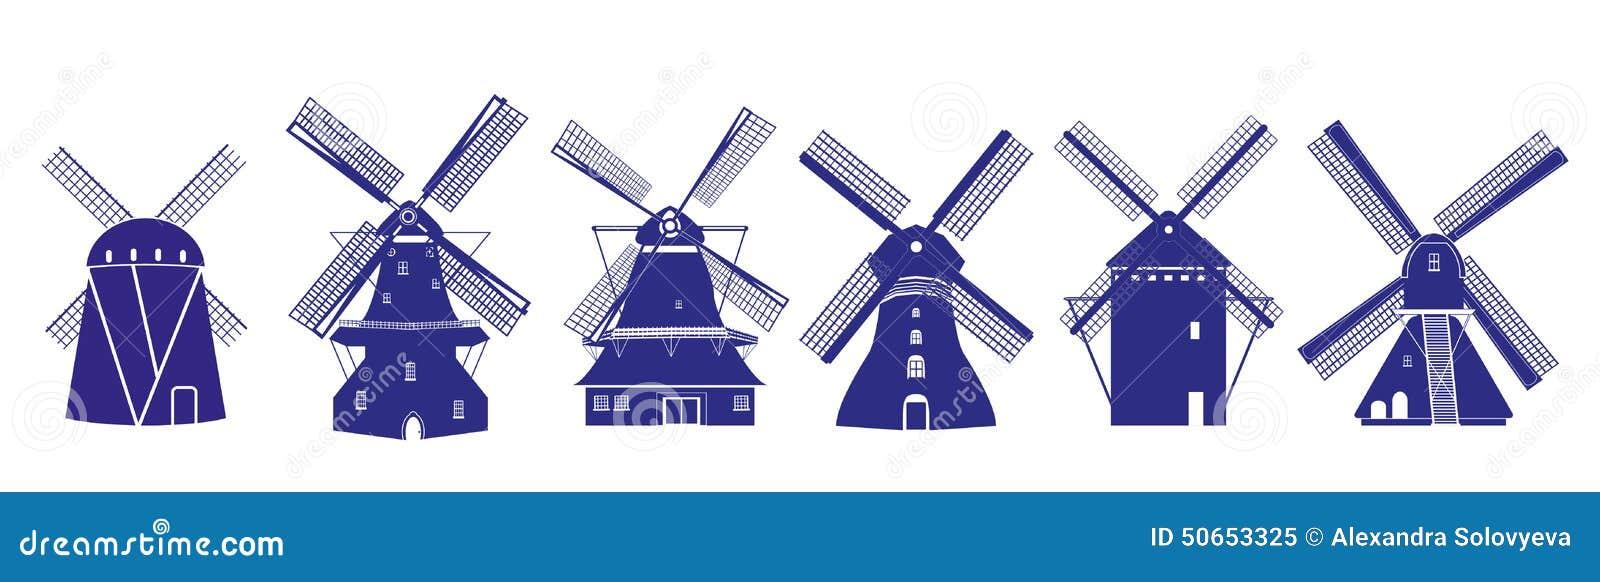 Stock Illustration Dutch Windmills Illustrations Delft Blue Colors Isolated Image50653325 on Vintage Kitchen Island